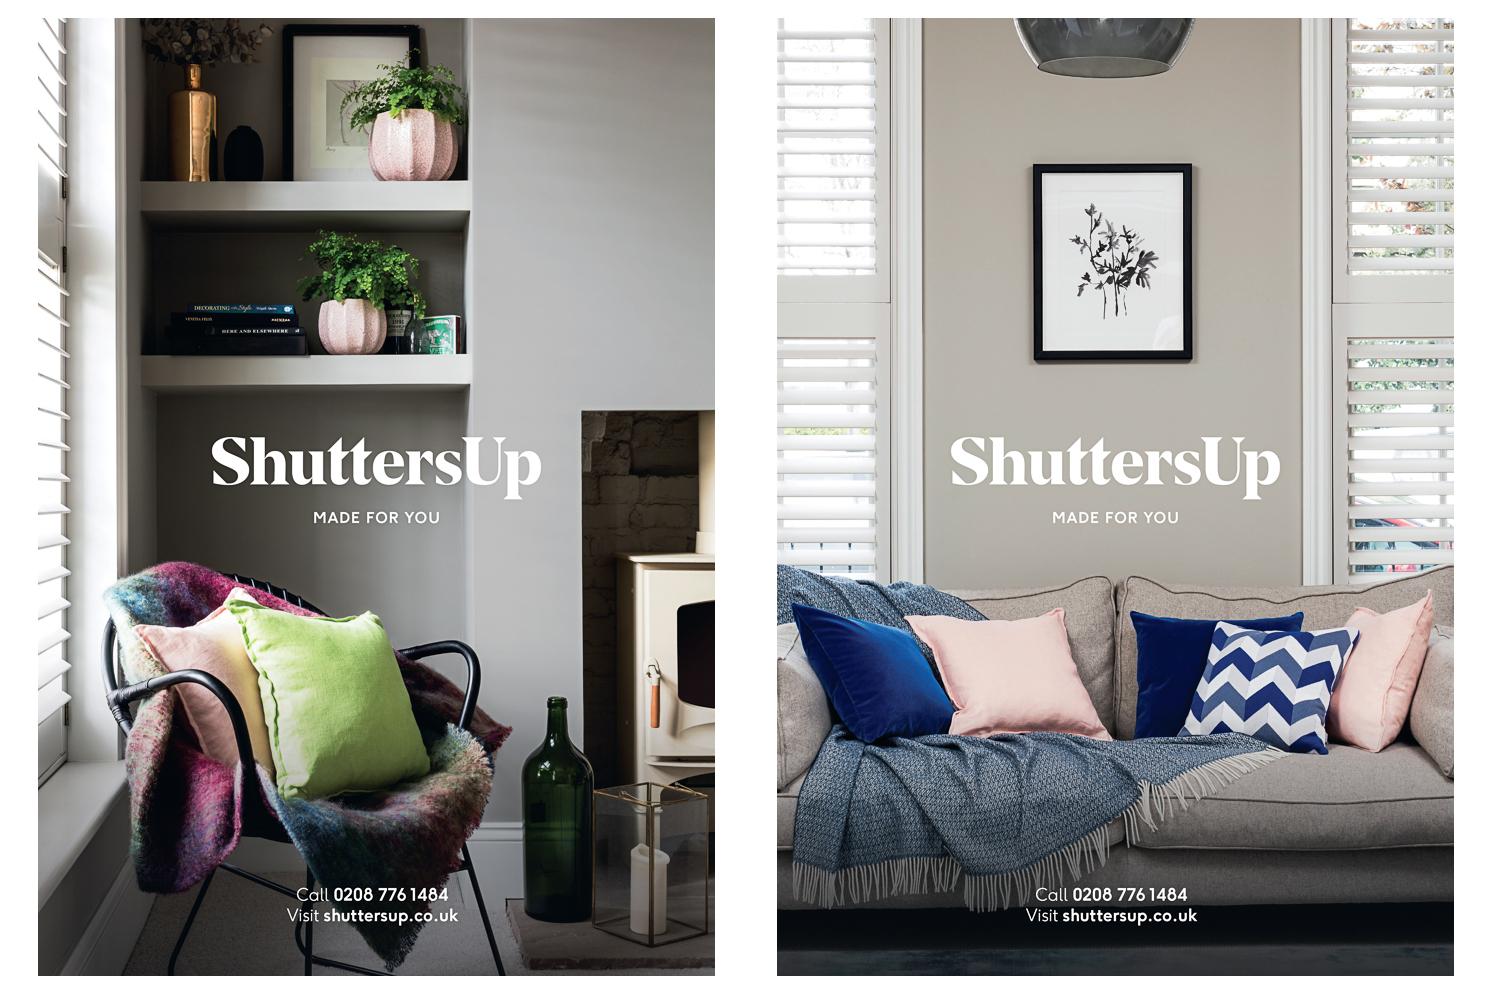 ShuttersUp_Dyptich7.jpg